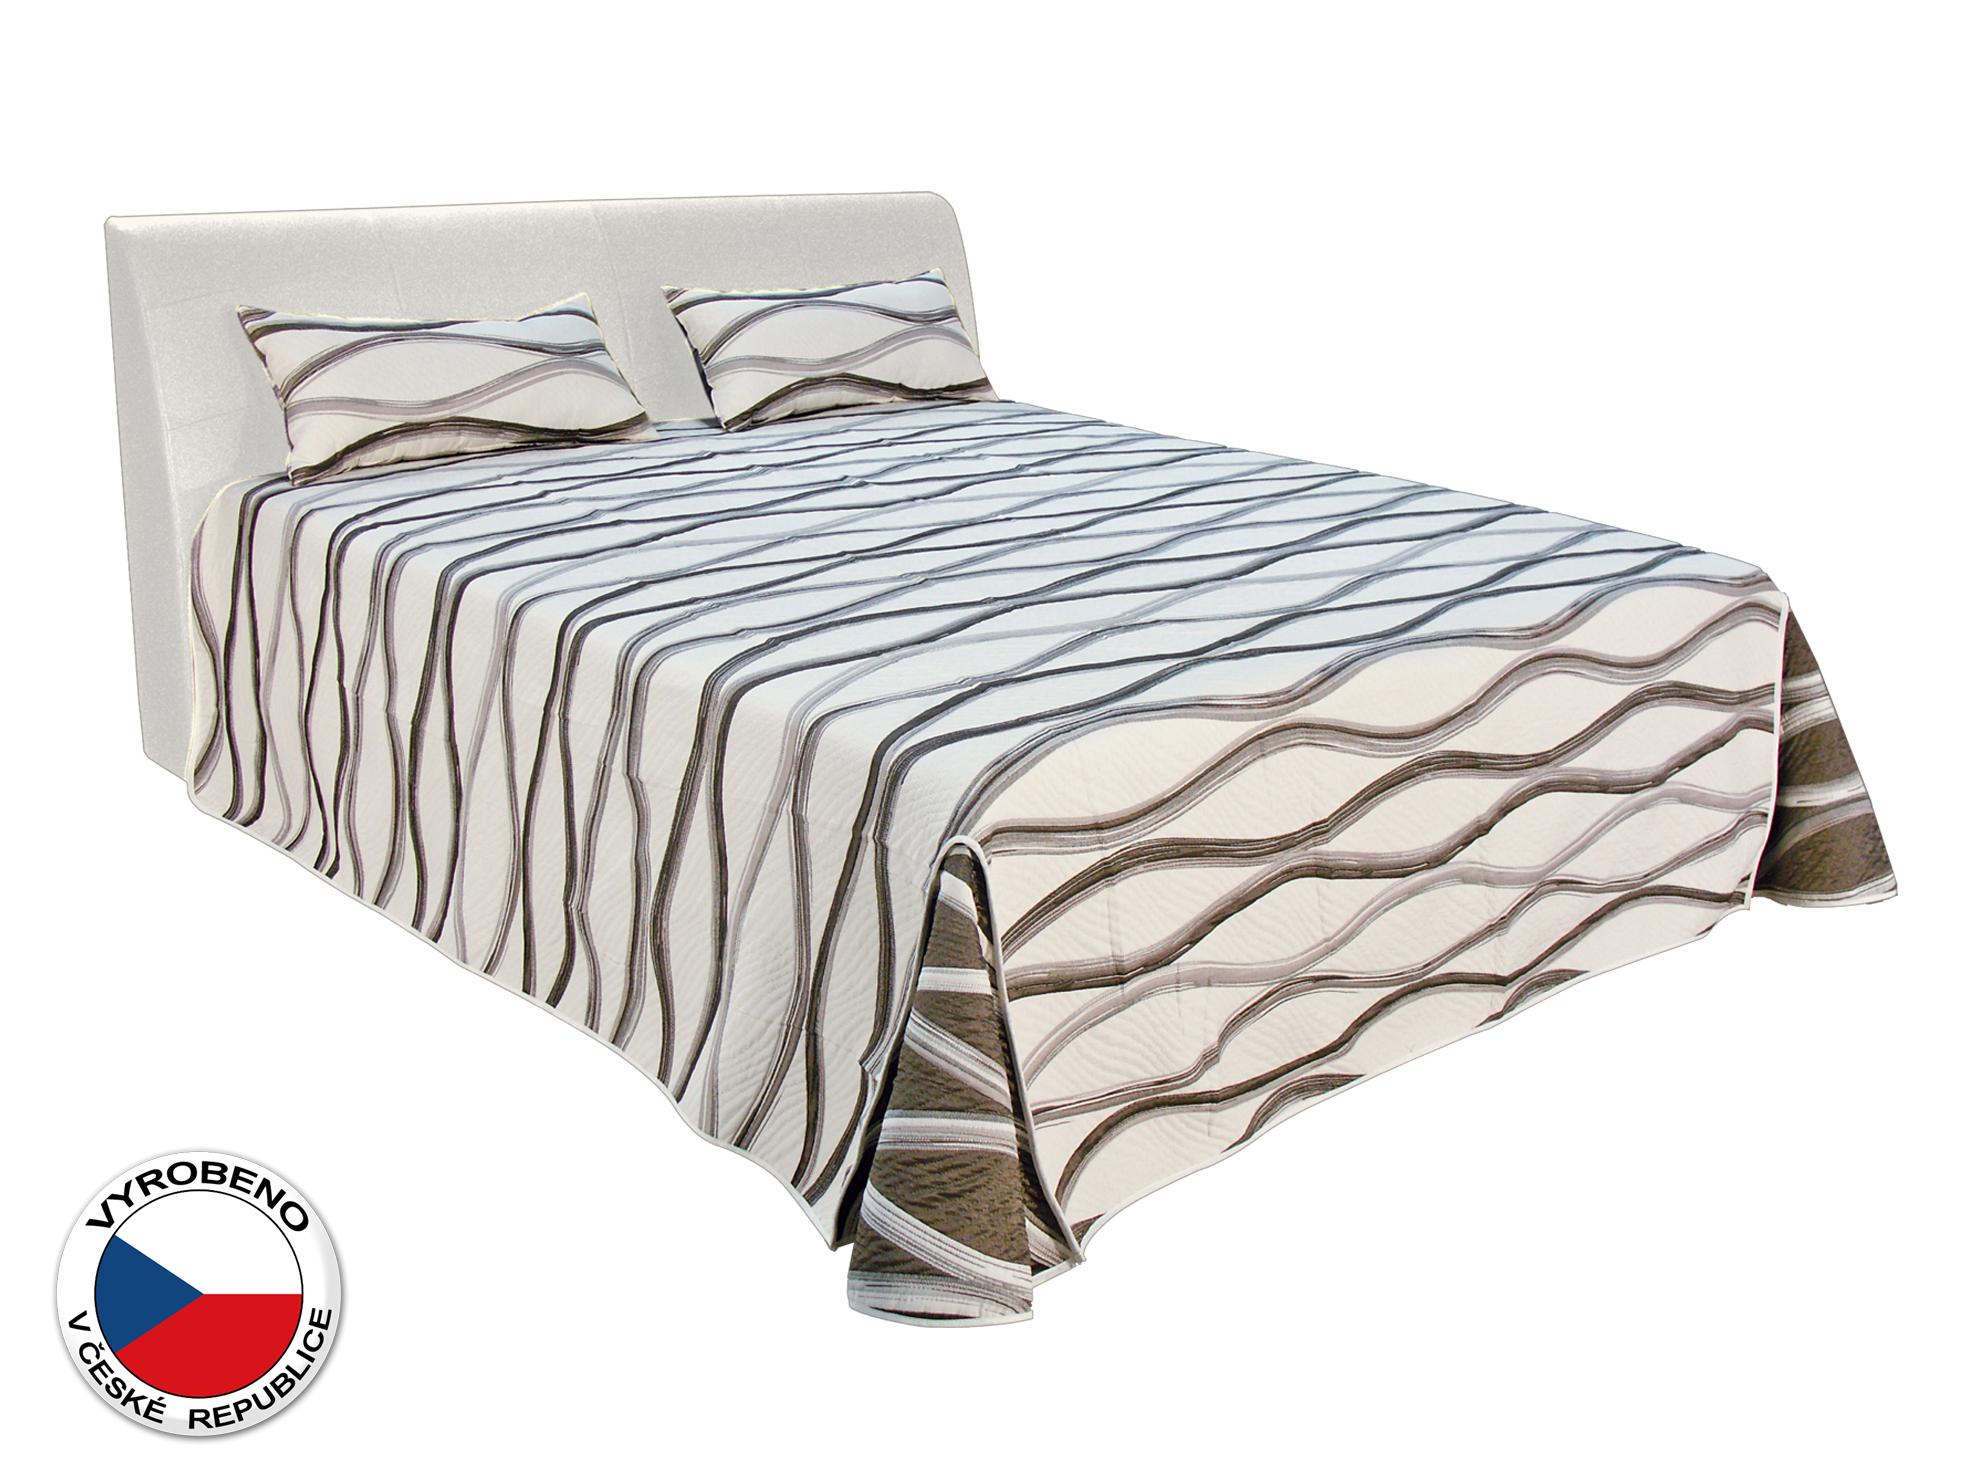 Manželská postel 180 cm - Blanář - Merkur (bílá) (s rošty a matracemi Ivana Plus)